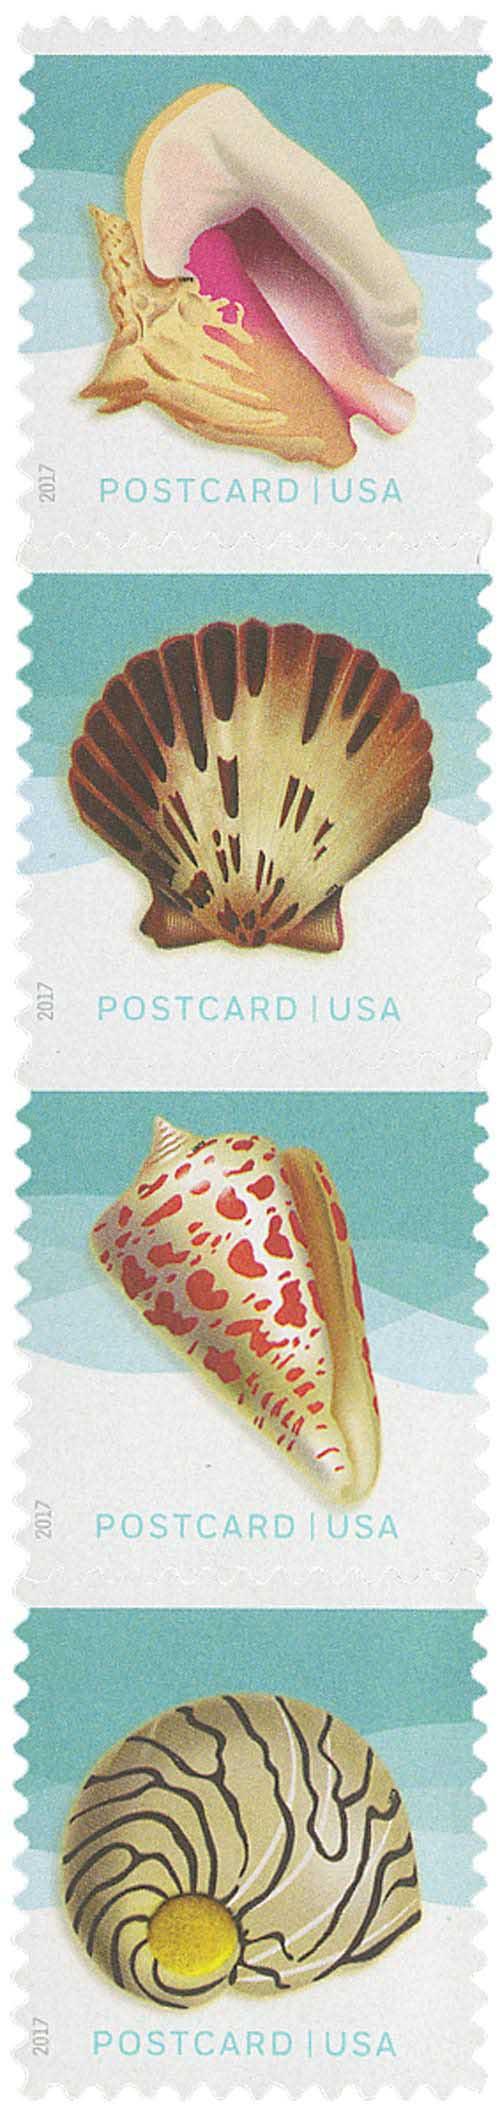 2017 34c Seashells